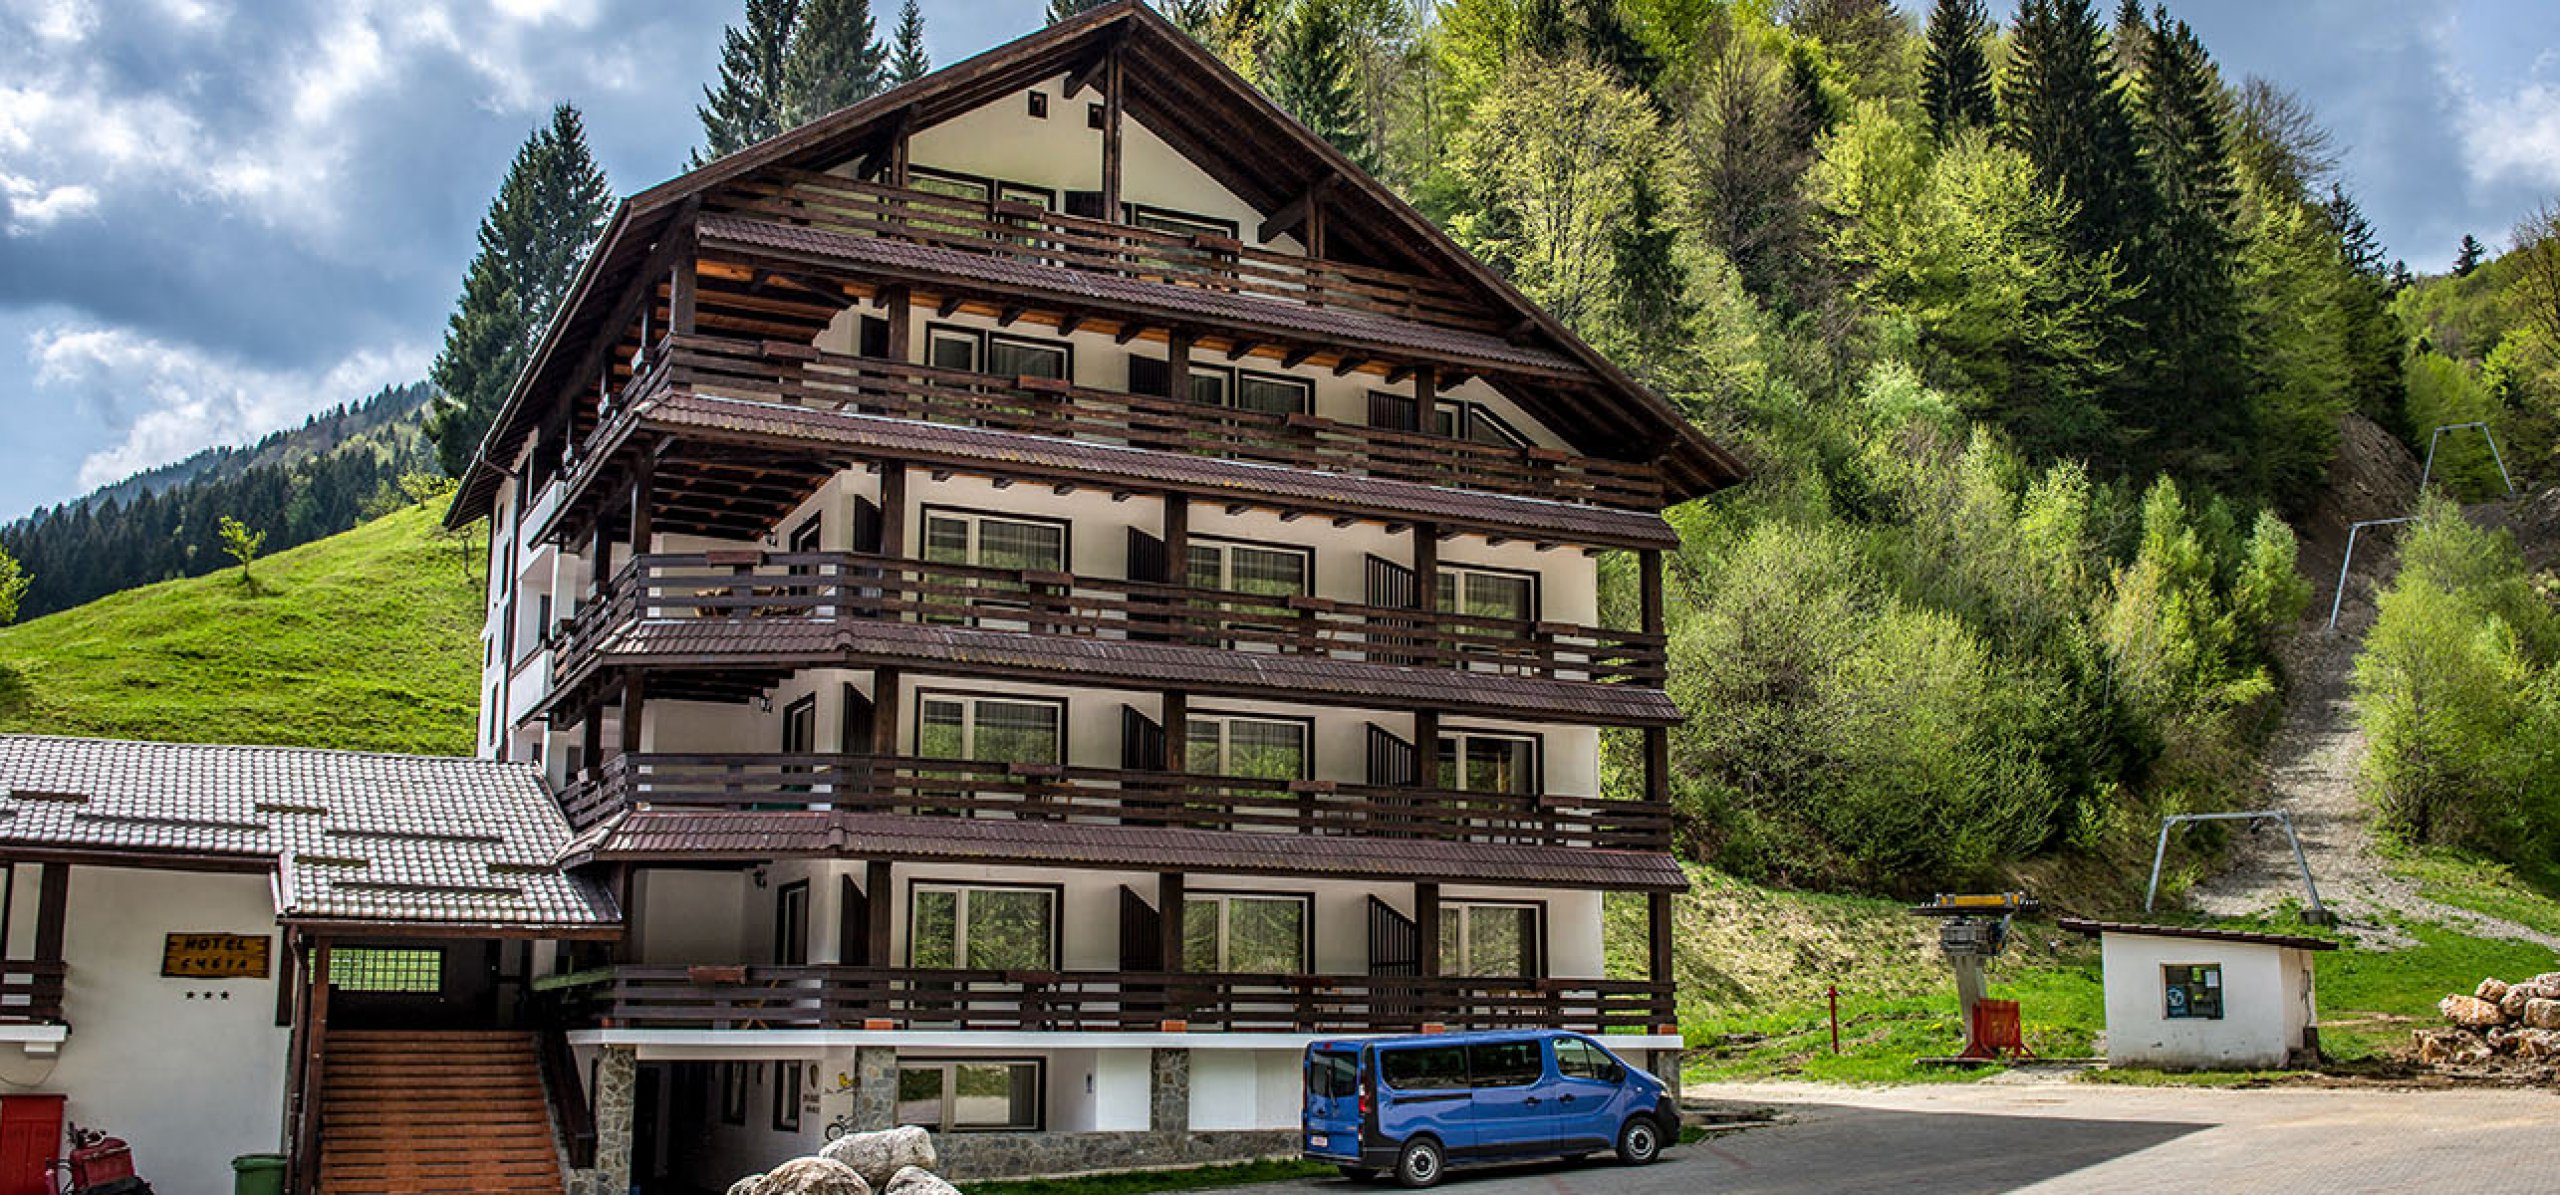 imagine-iconica-hotel-cheia-hoteluri-moeciu-1